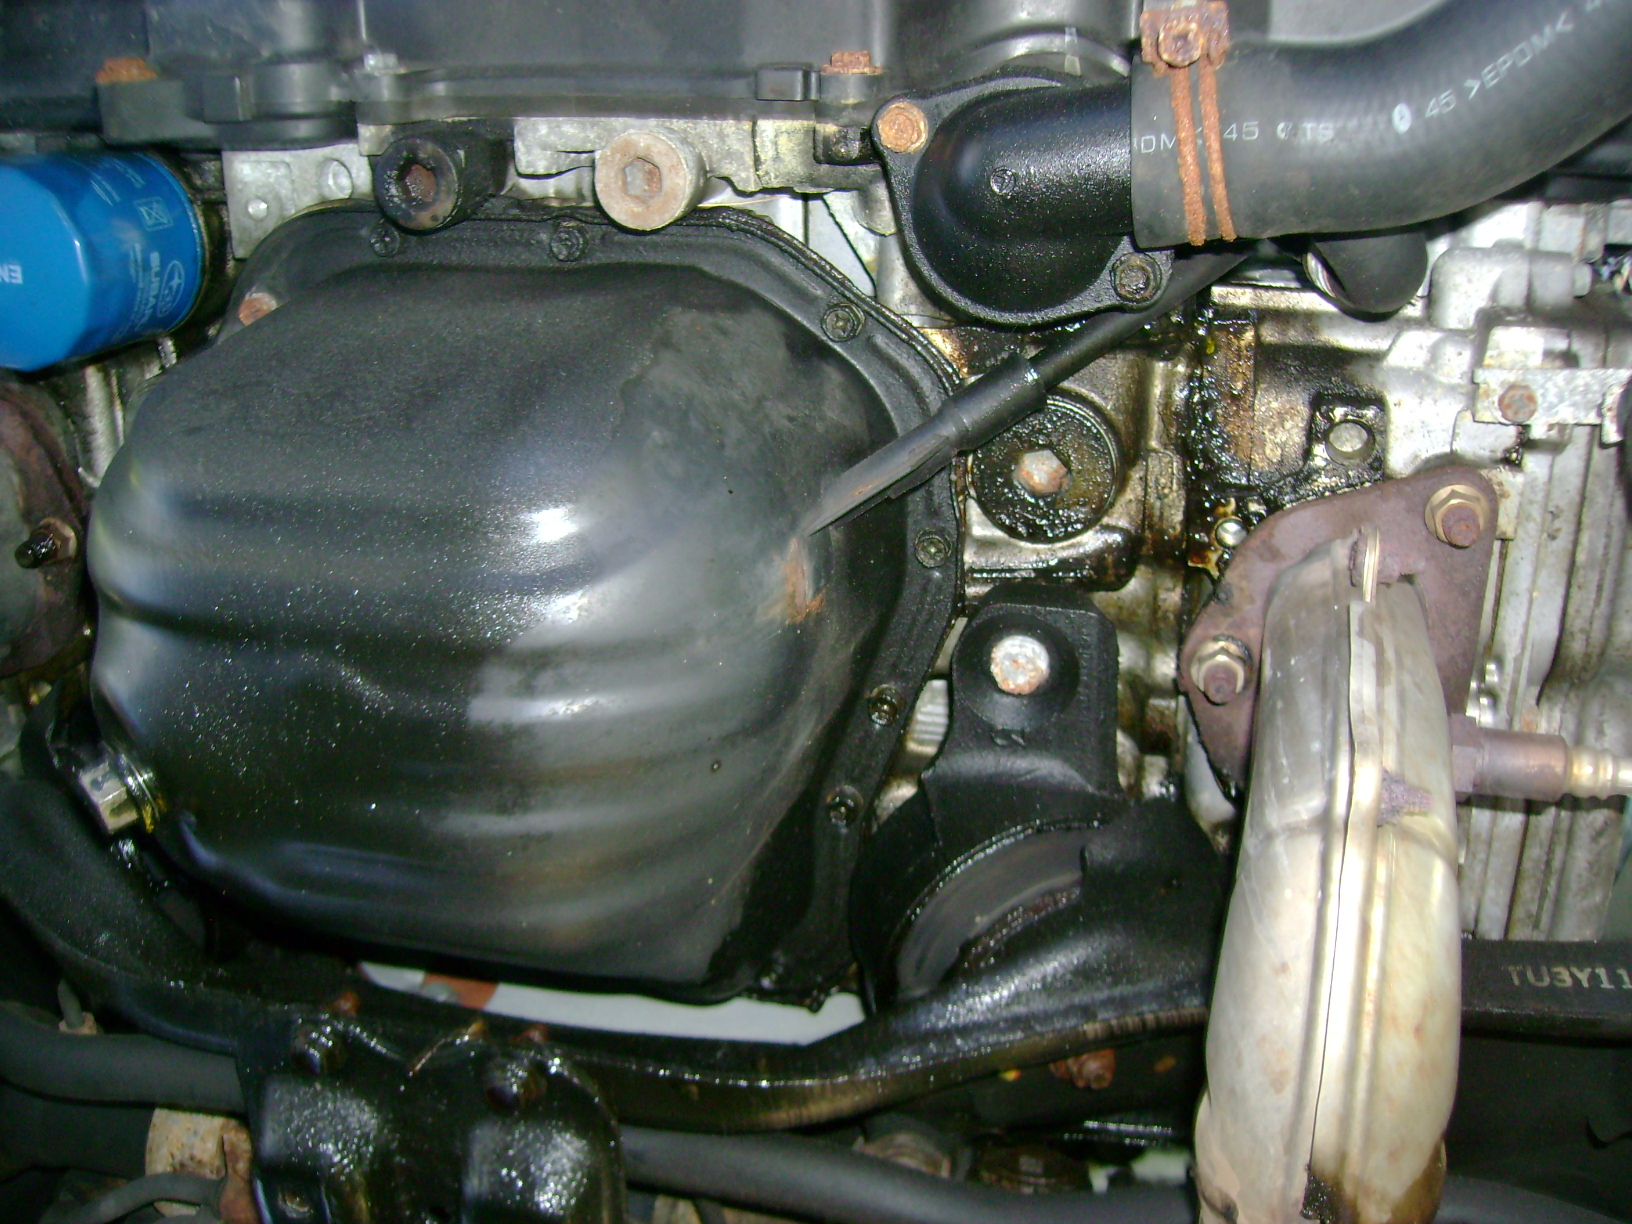 Please help with my oil leak - photos!! - Subaru Outback - Subaru ...